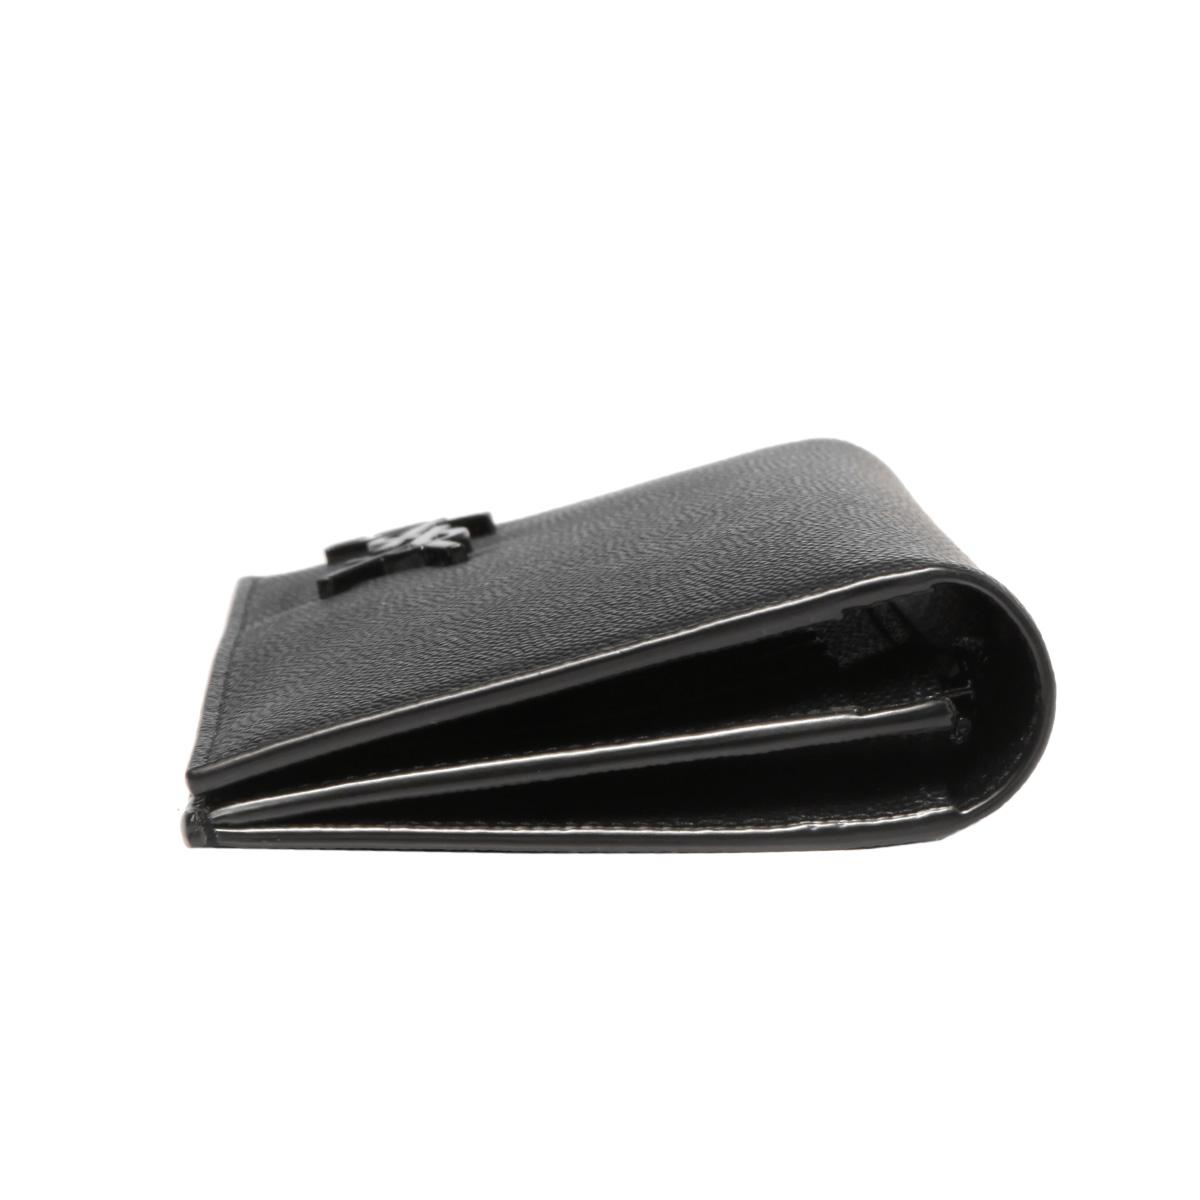 SAINT LAURENT サン ローラン | 二つ折り長財布 | MONOGRAM モノグラム